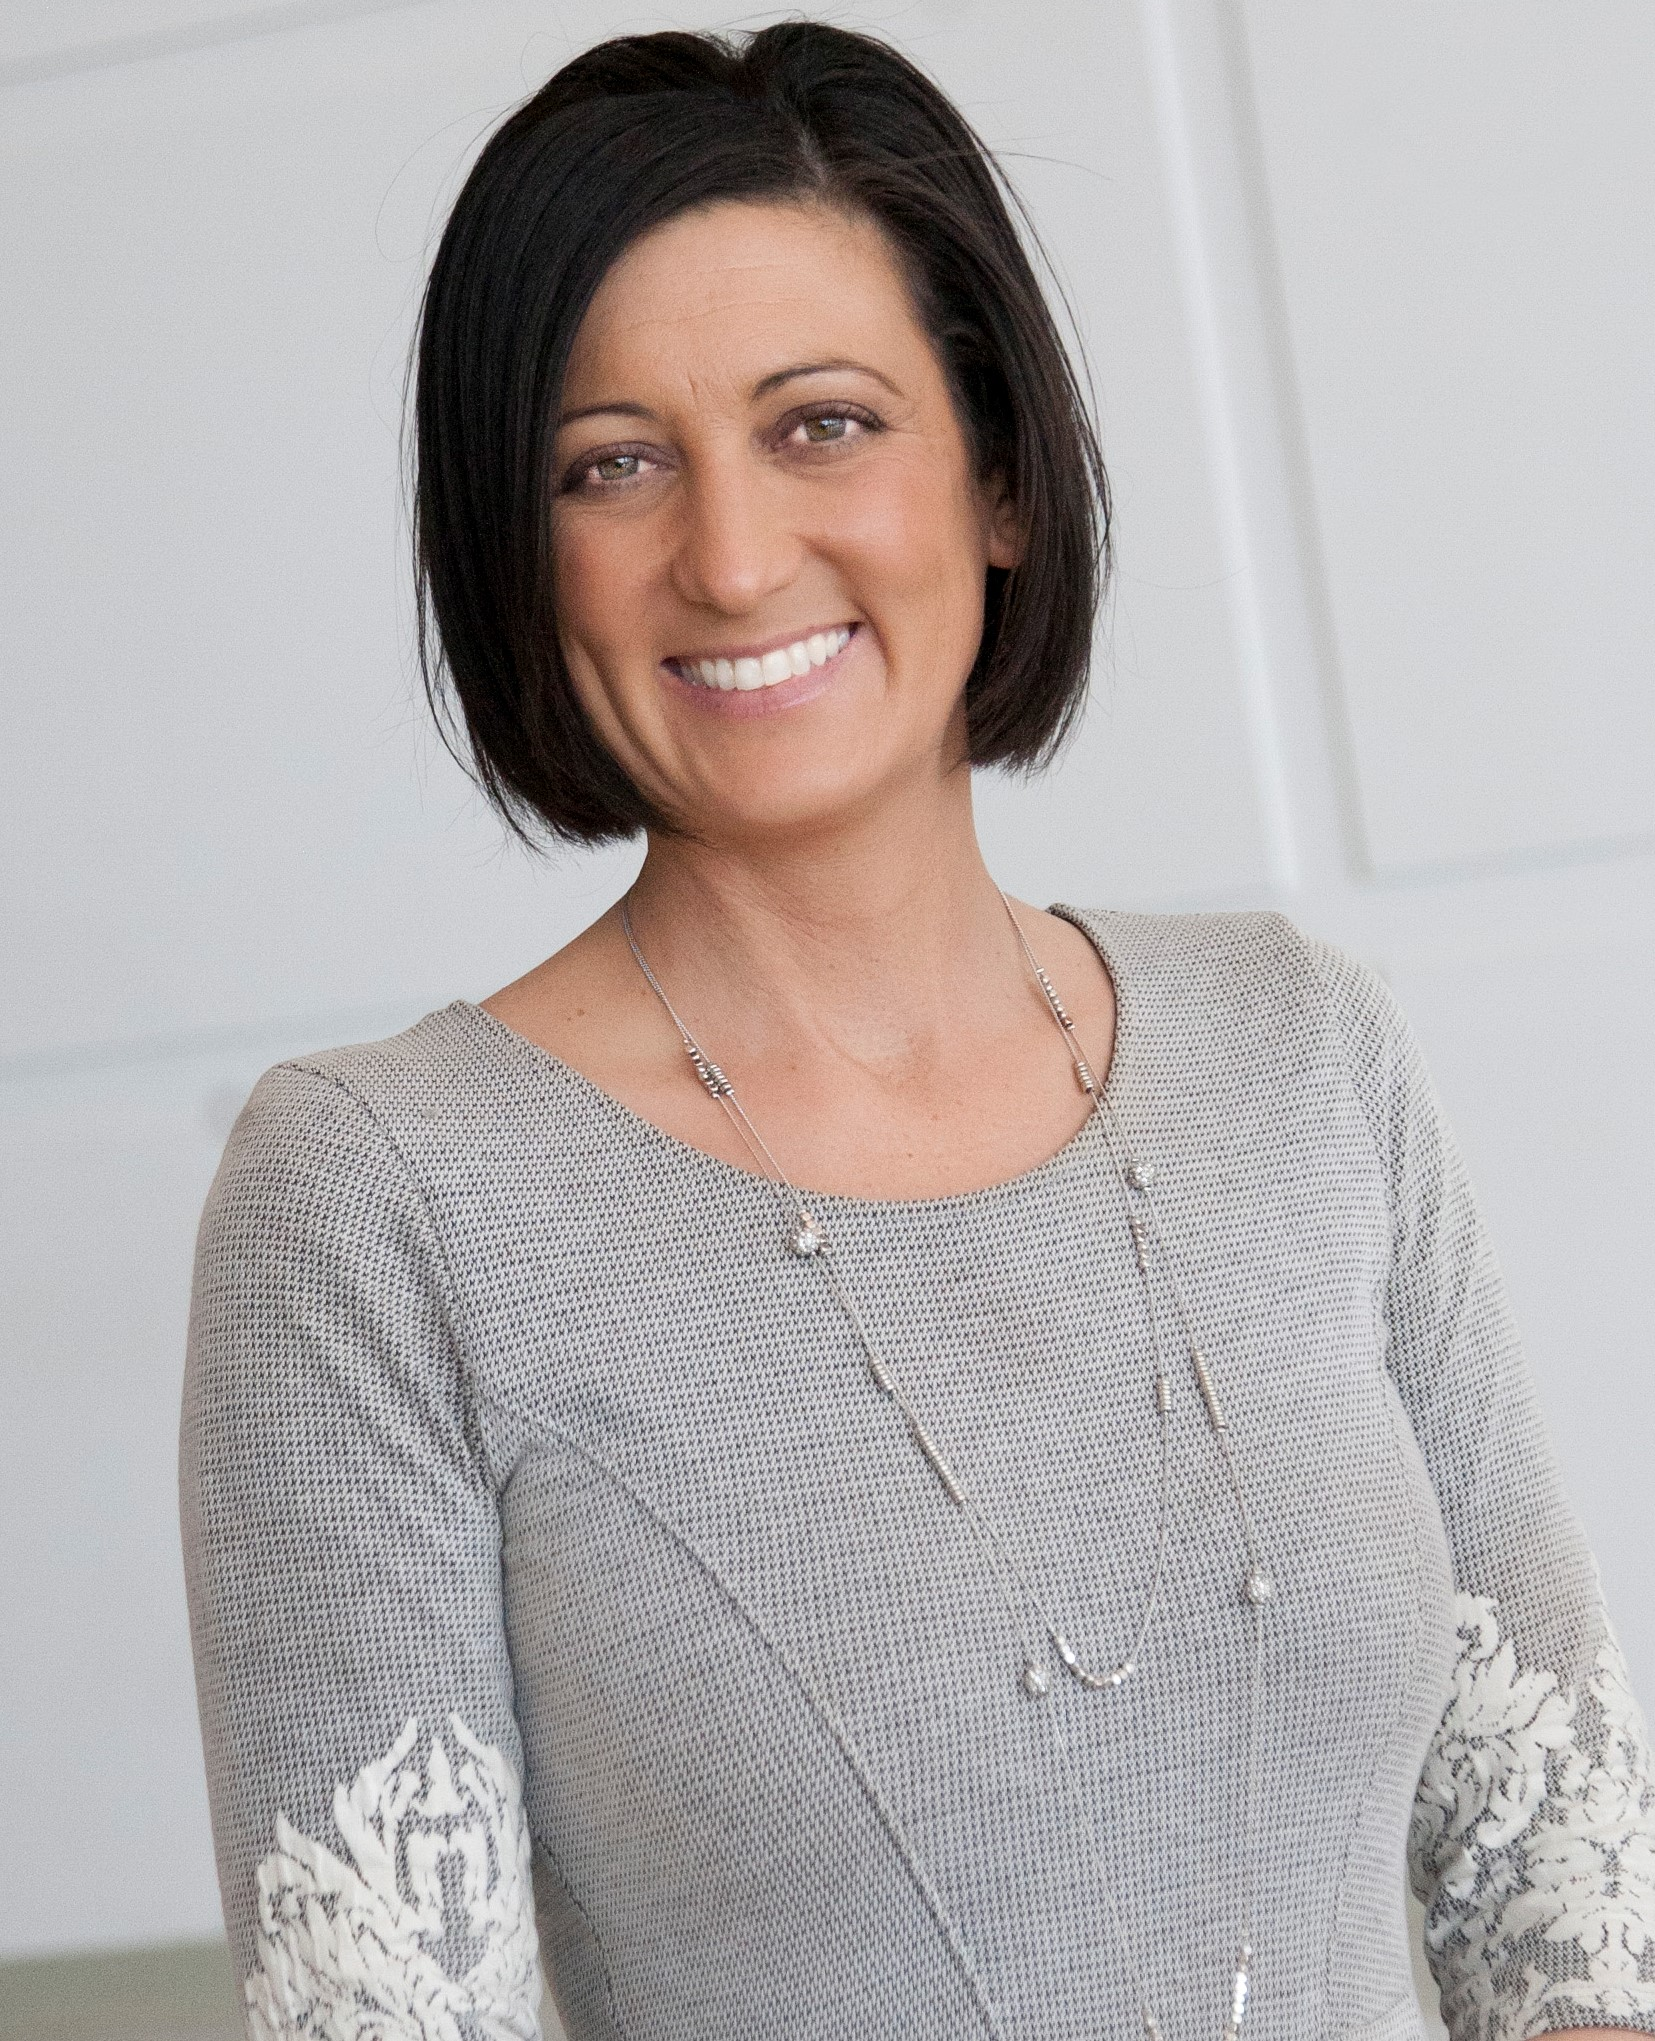 Jessica Marsh